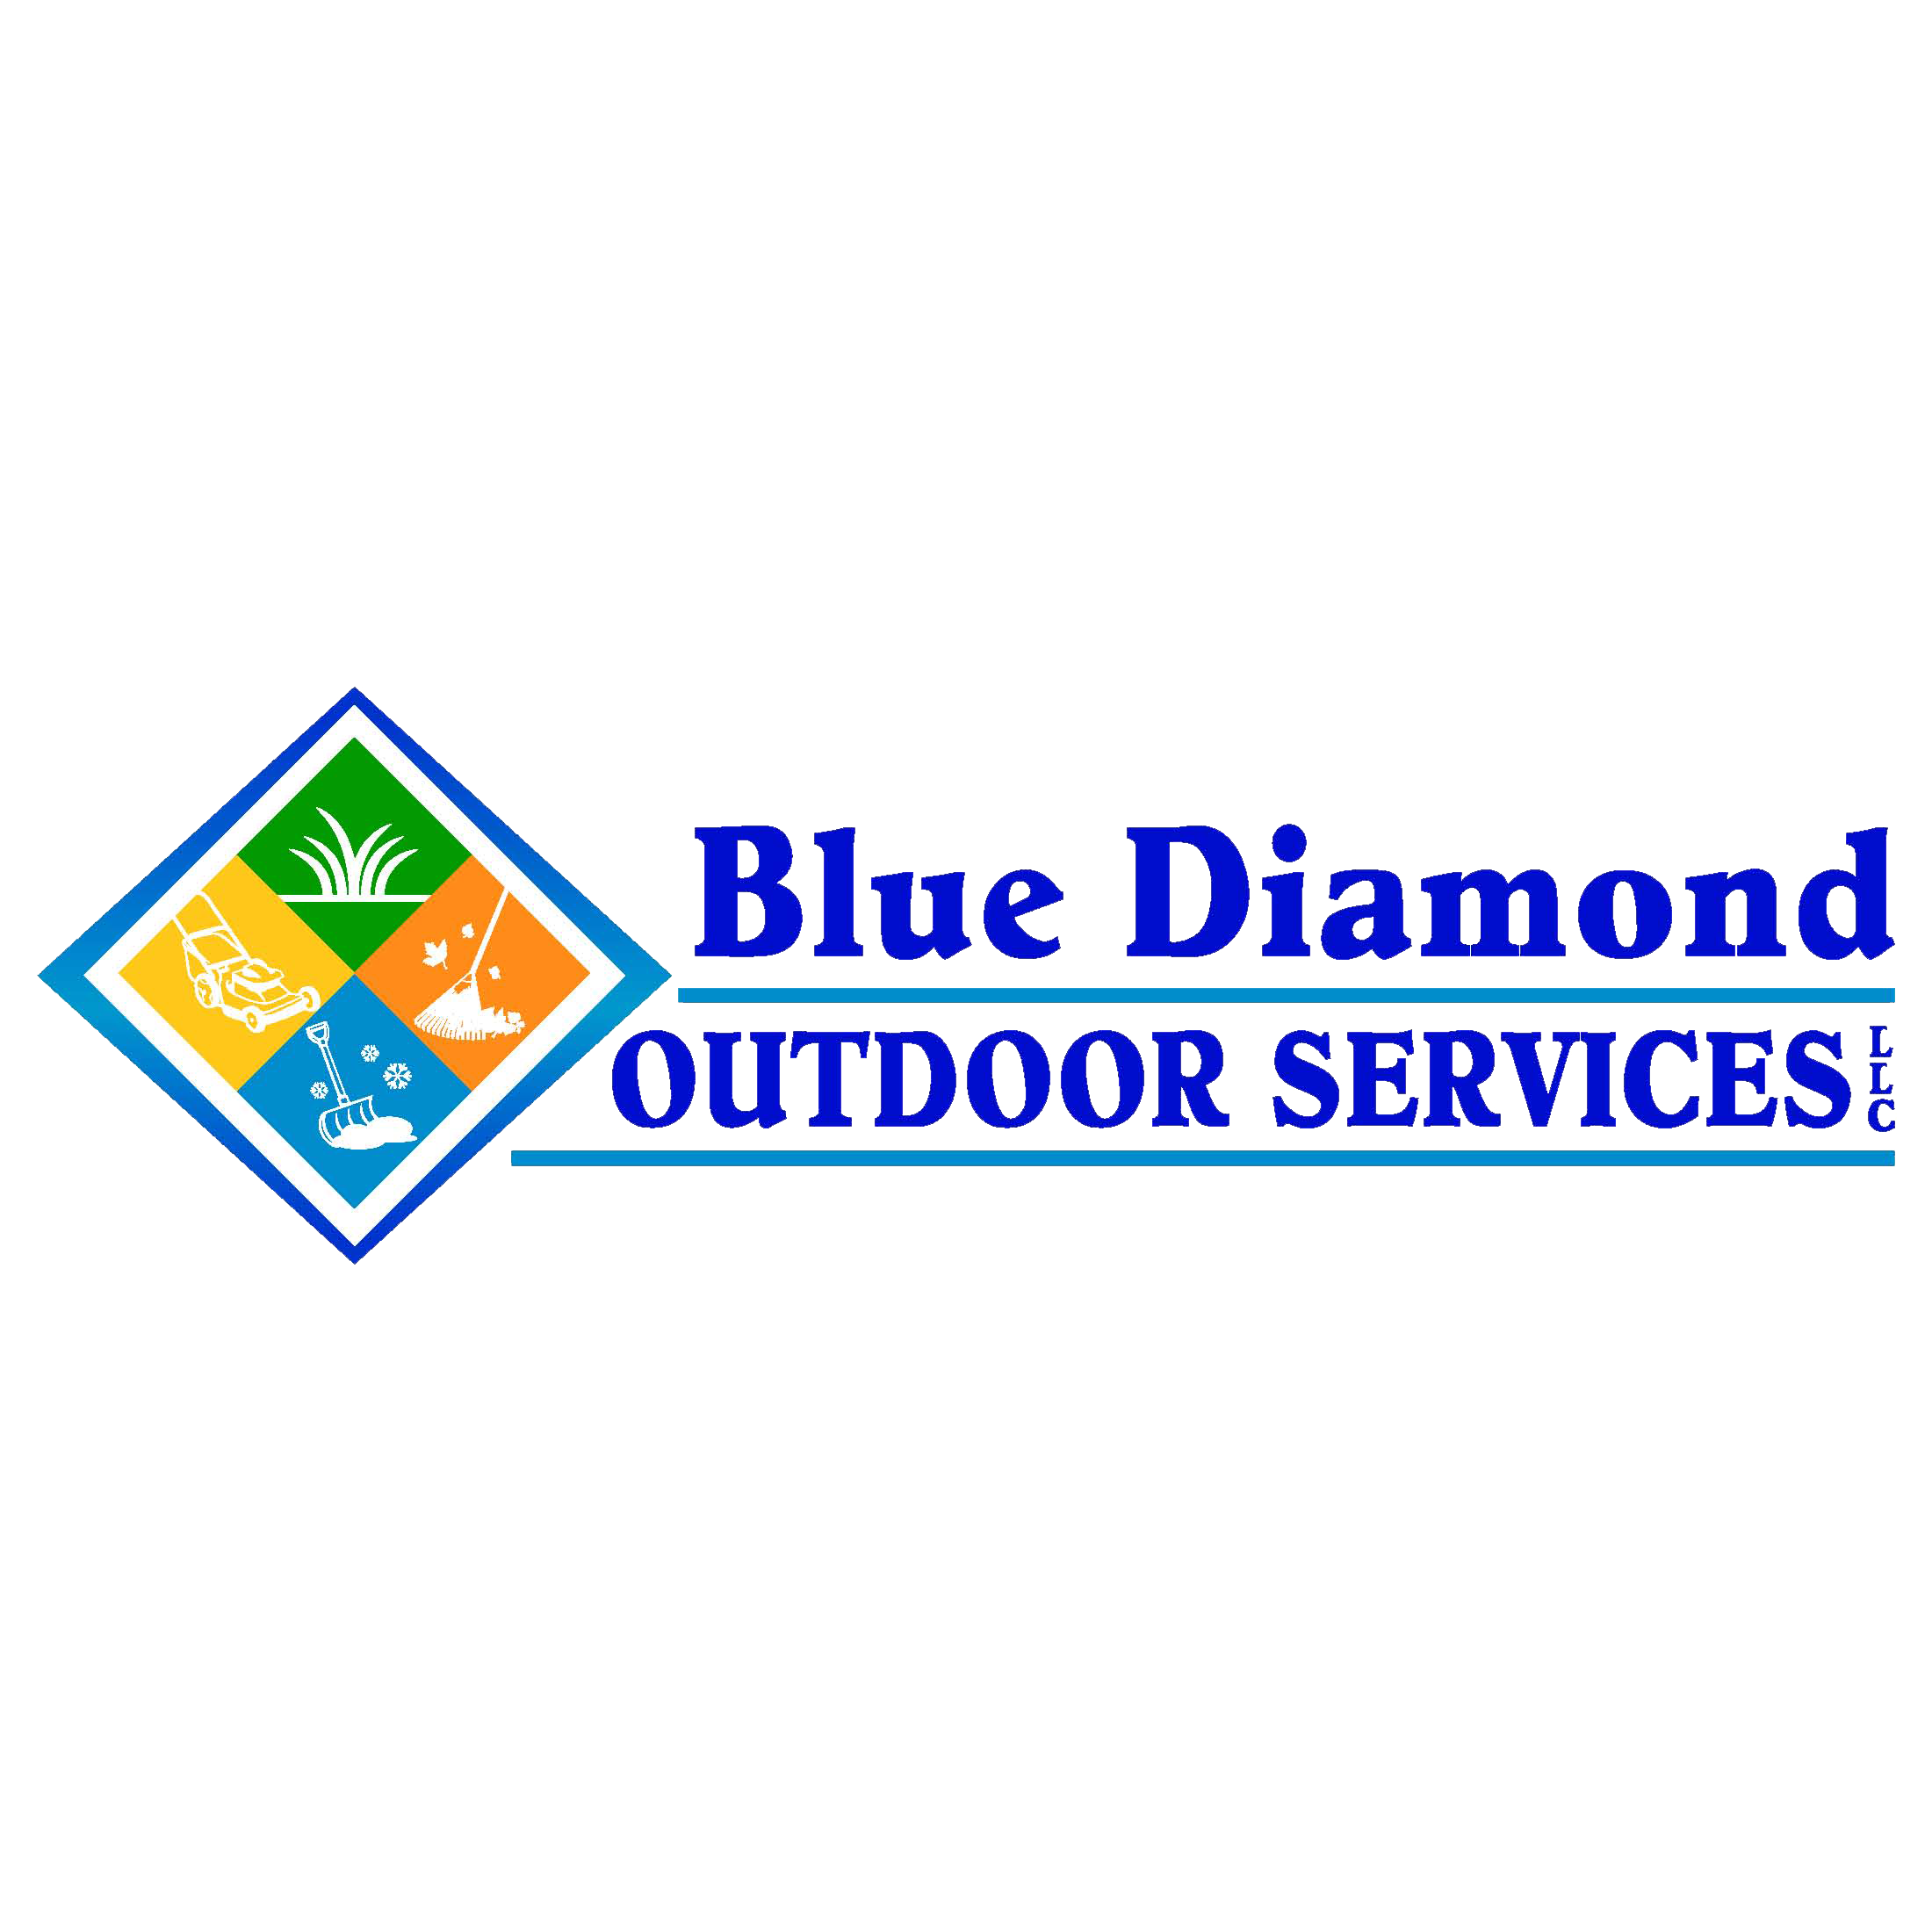 Blue Diamond Outdoor Services